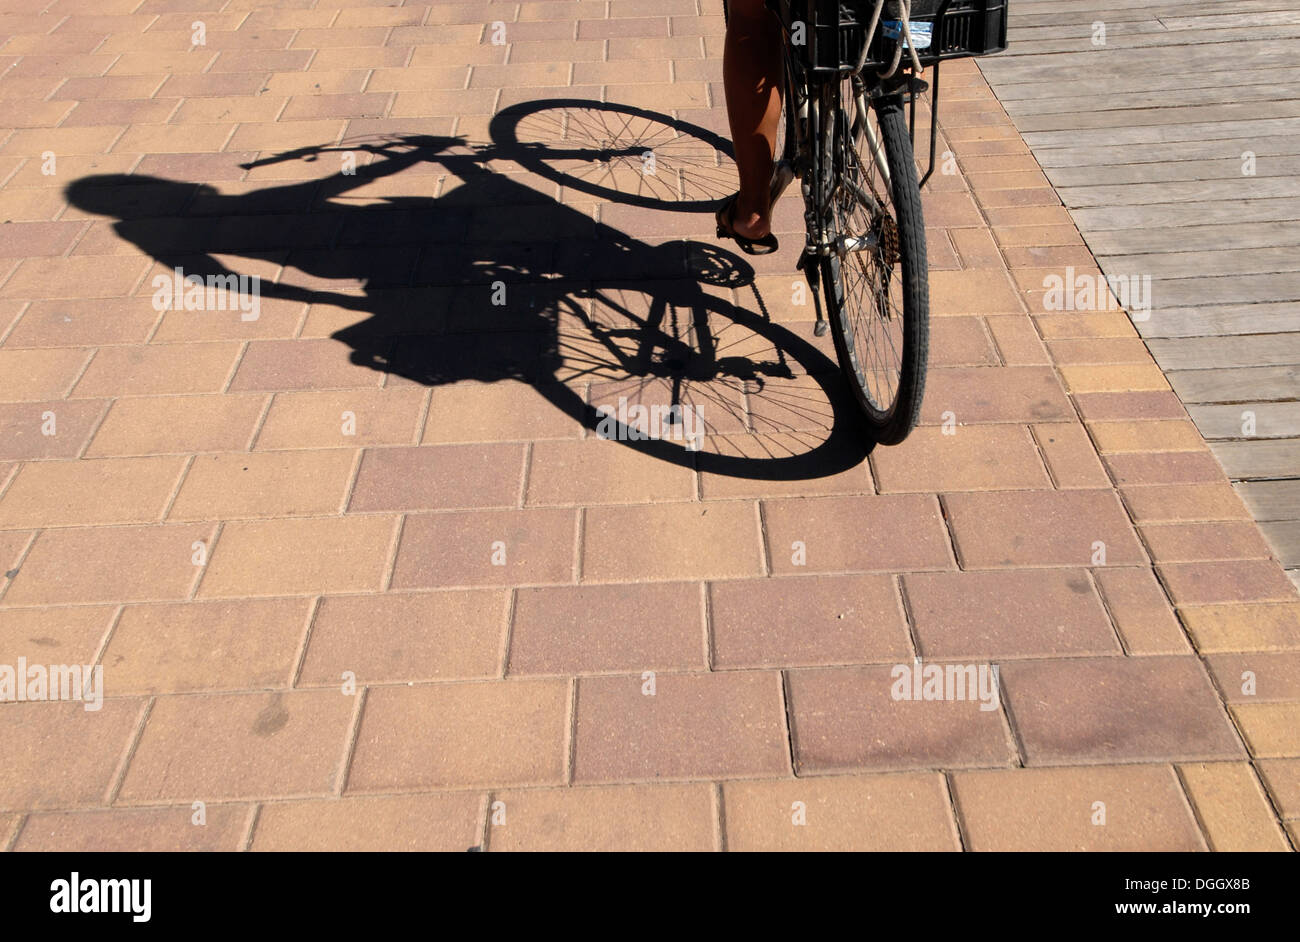 Young brazilian woman in her bike, La Savina, Formentera Stock Photo